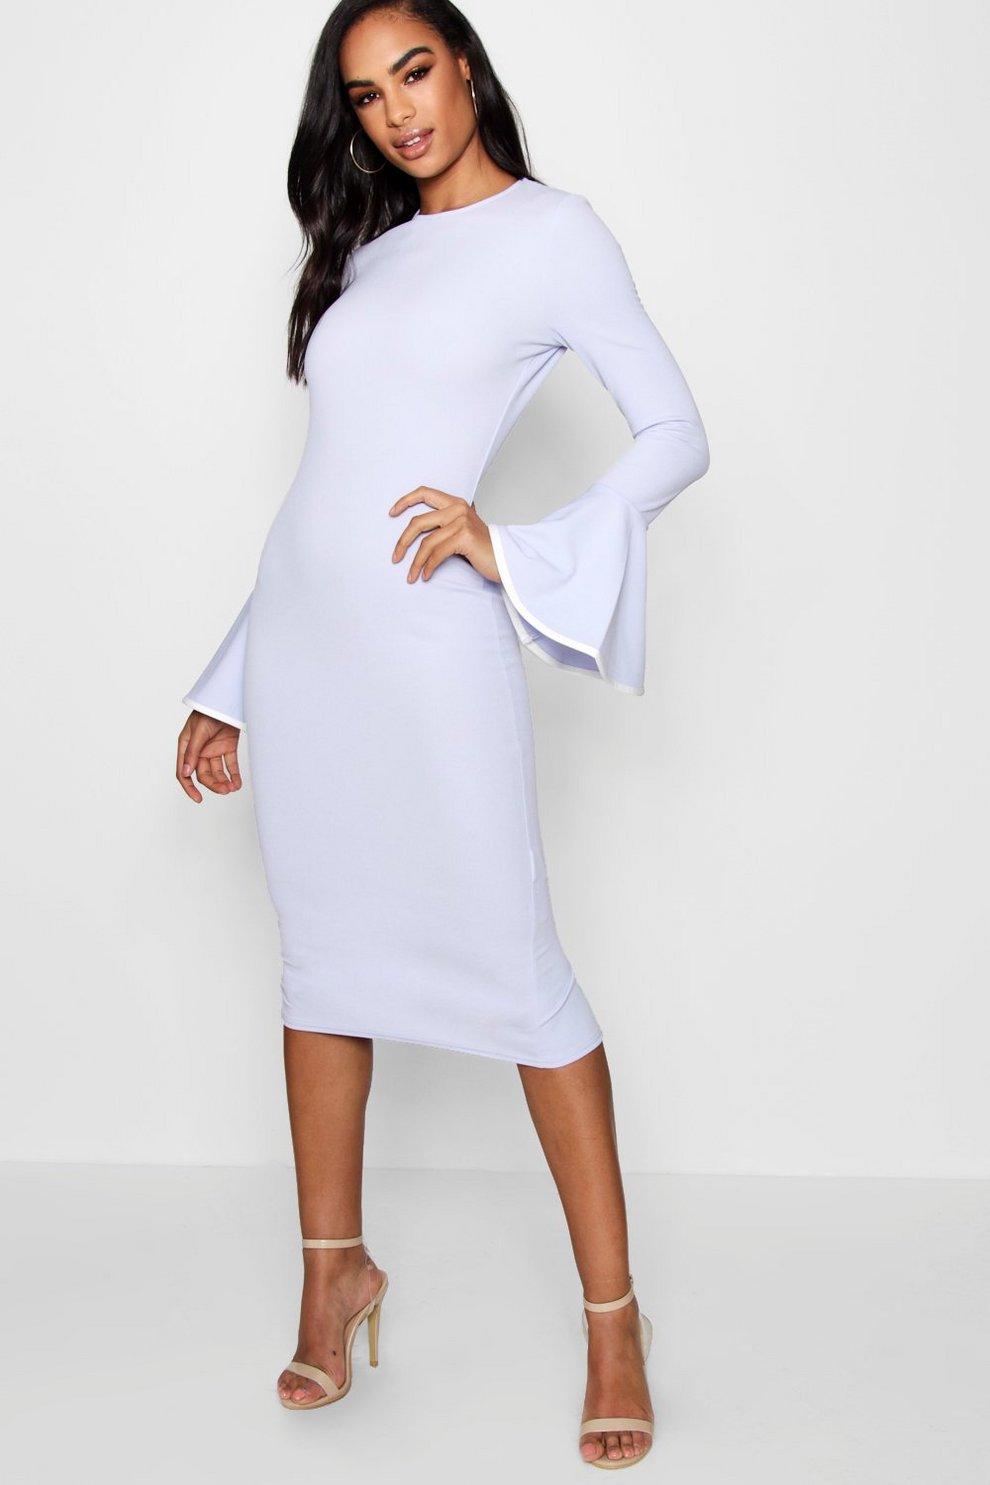 Boohoo Flared Sleeve Bodycon Dress Discount Newest 6kqOVfQiI